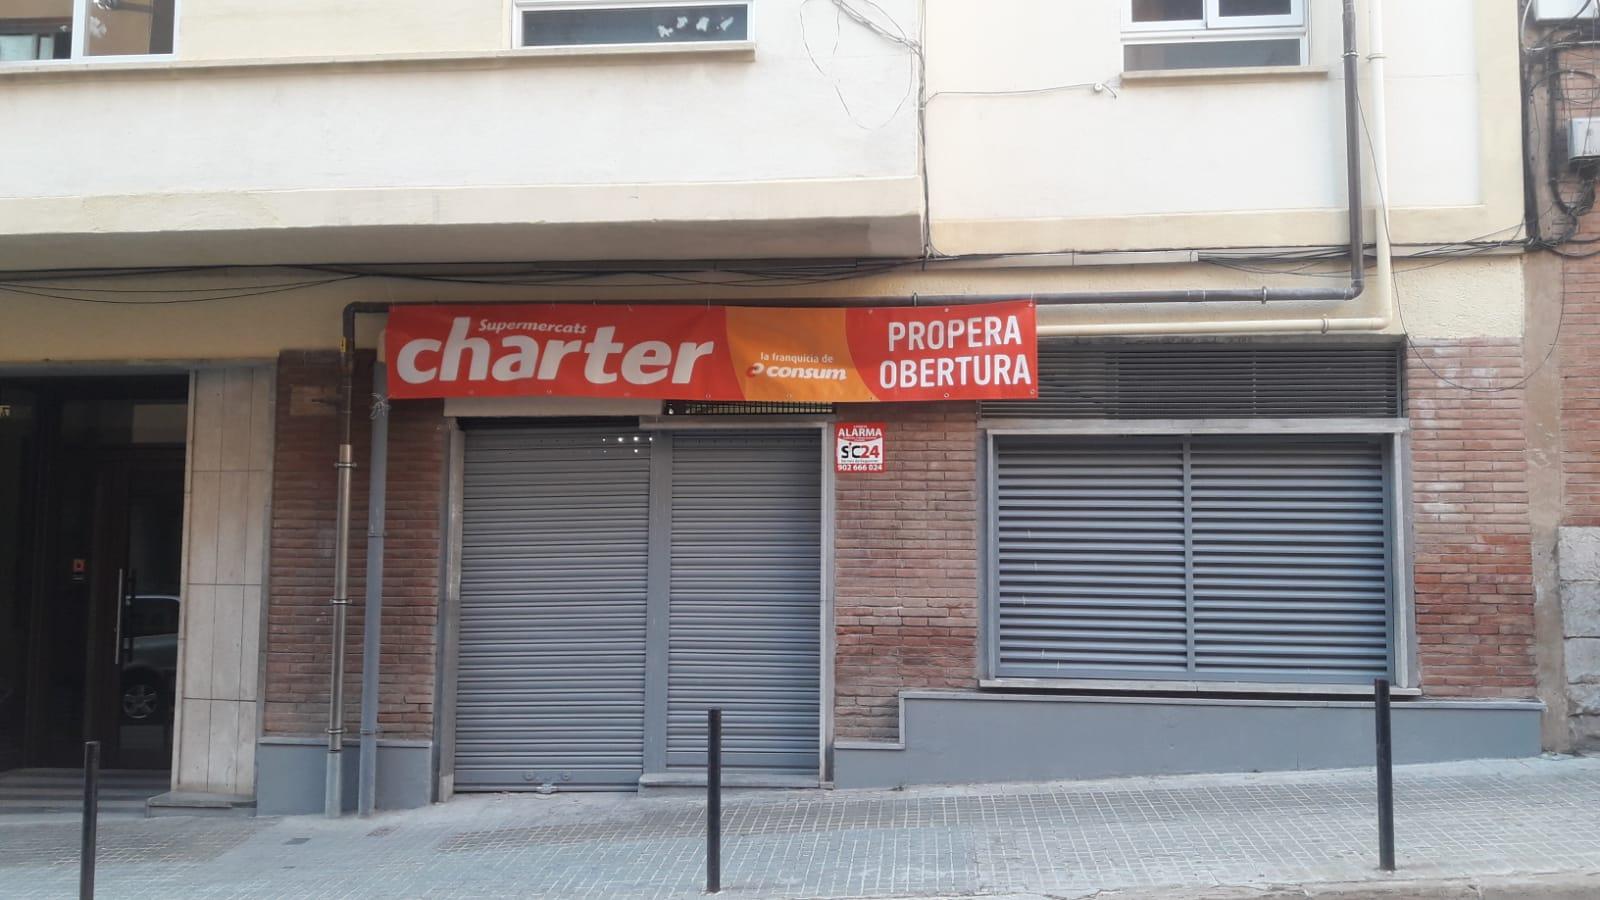 Nou supermercat a Terrassa | J.M.O.